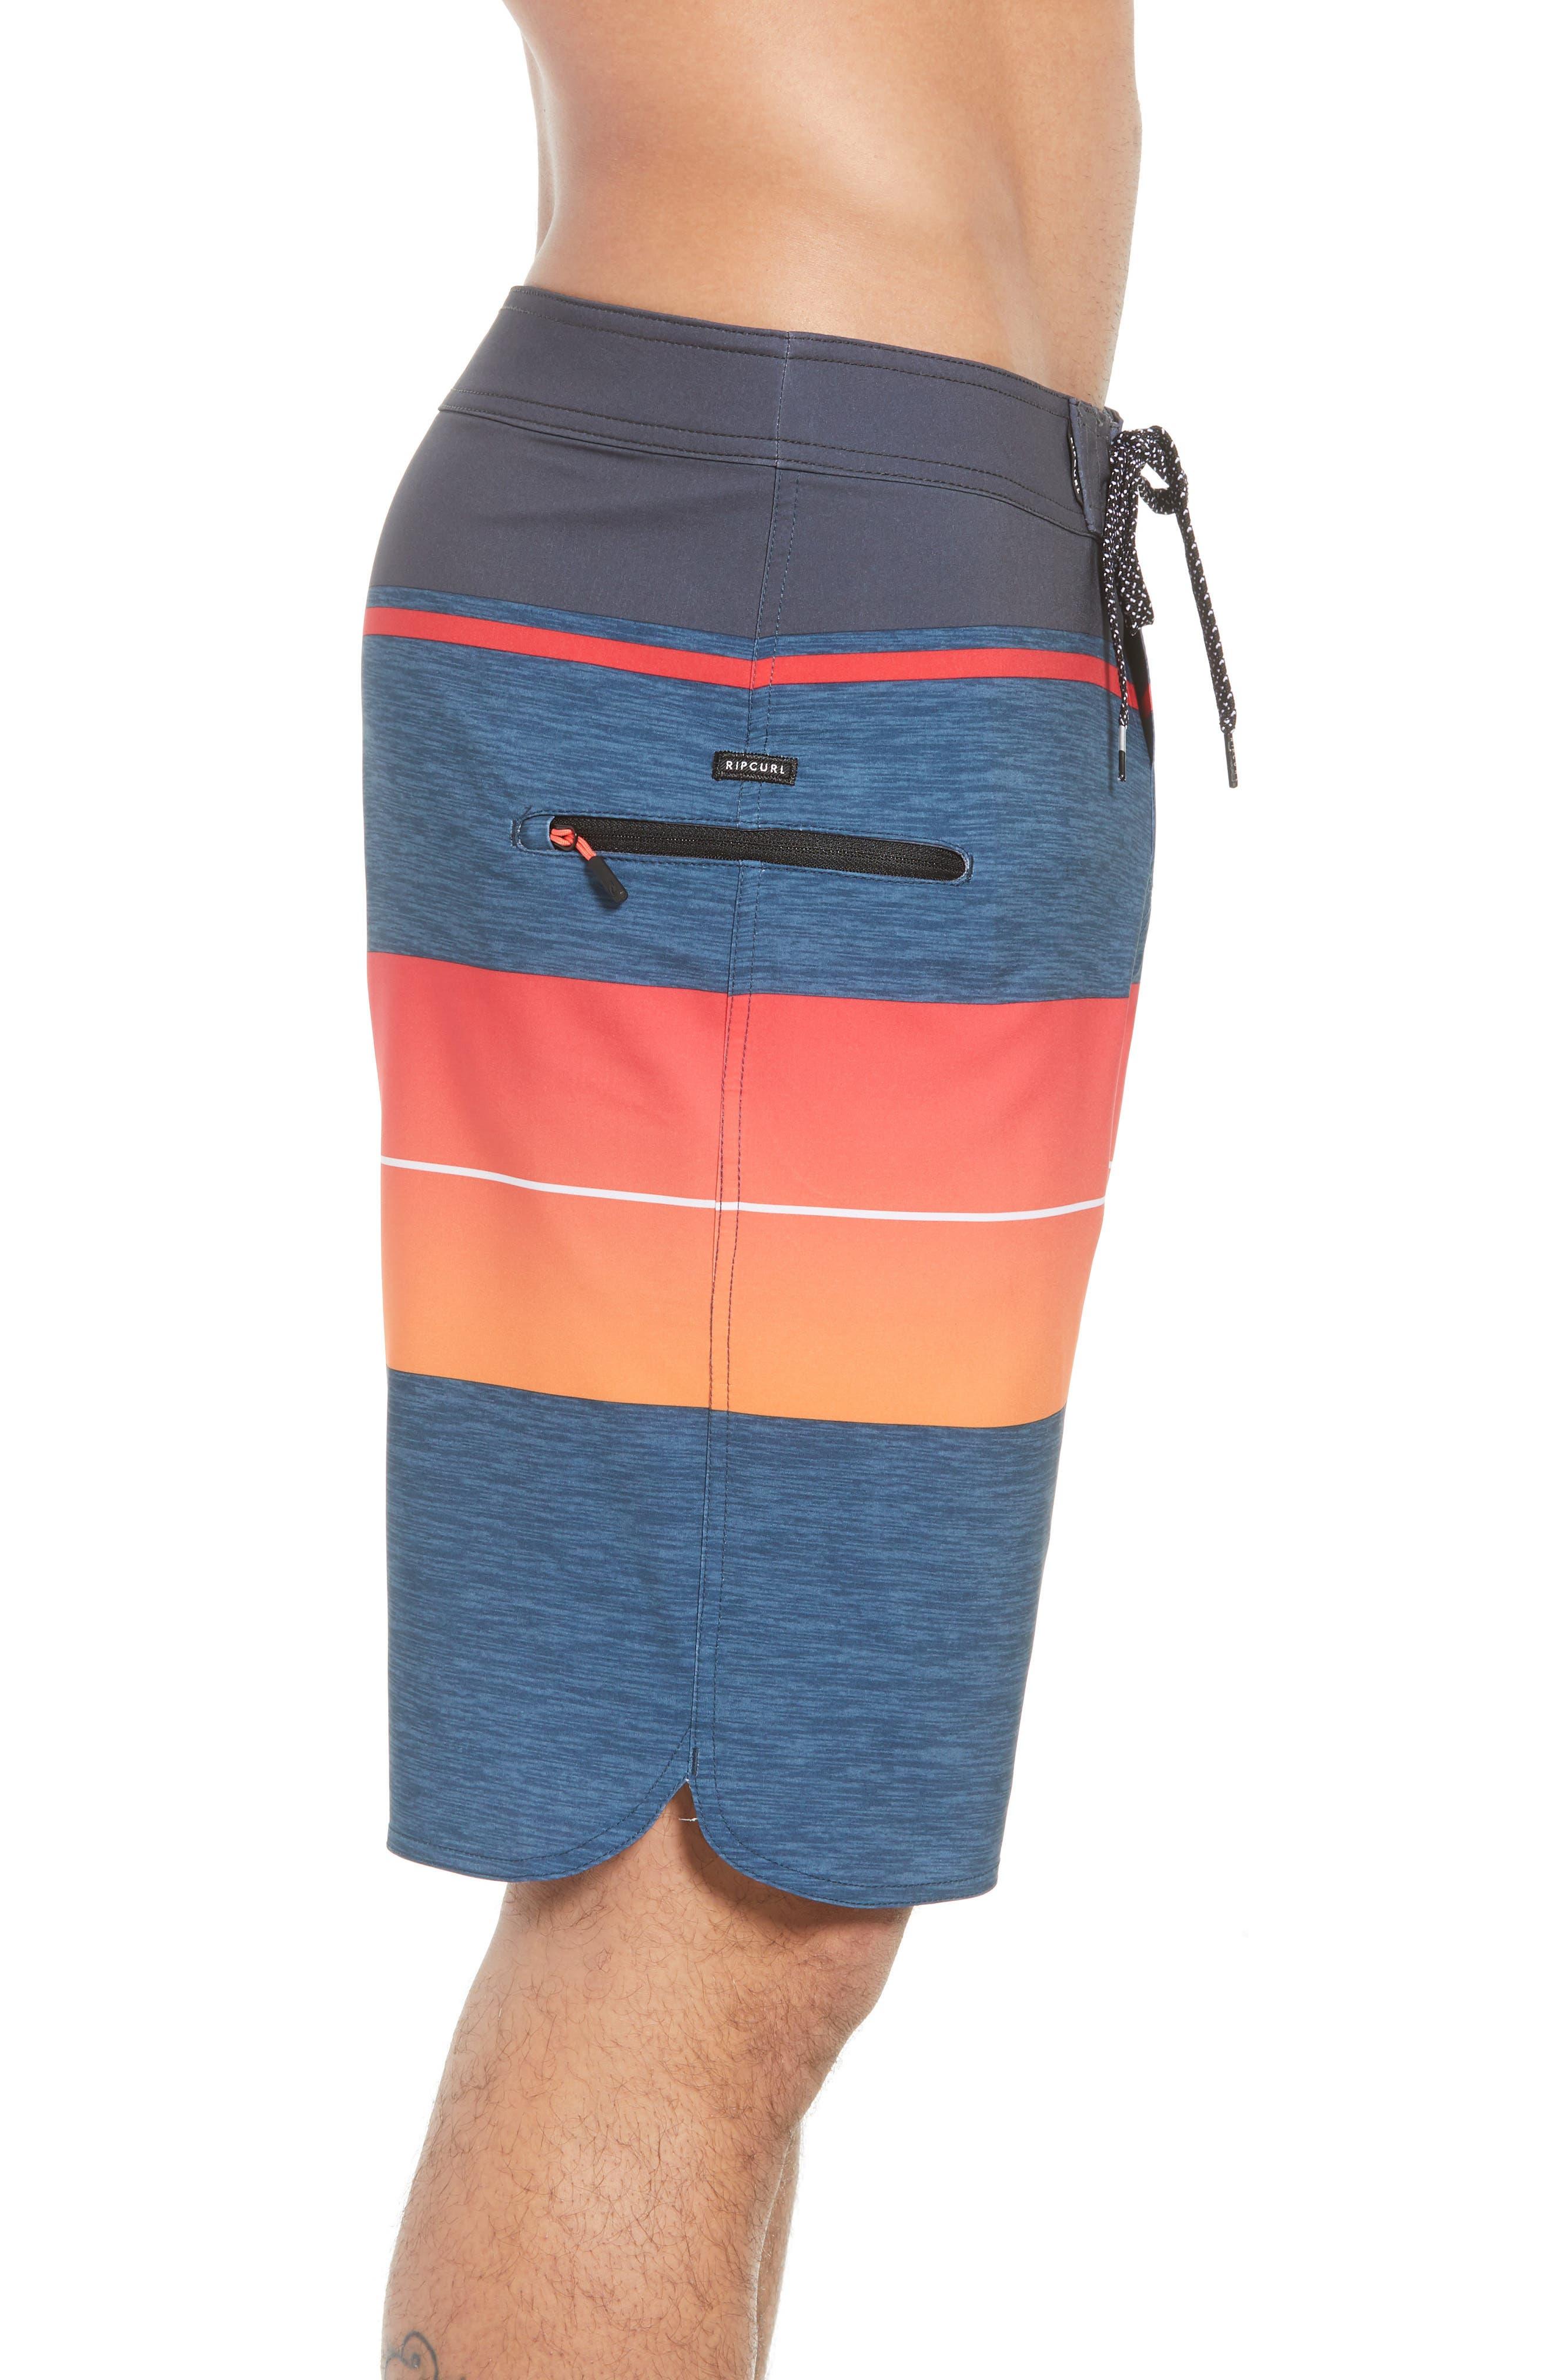 Mirage Eclipse Board Shorts,                             Alternate thumbnail 4, color,                             Orange